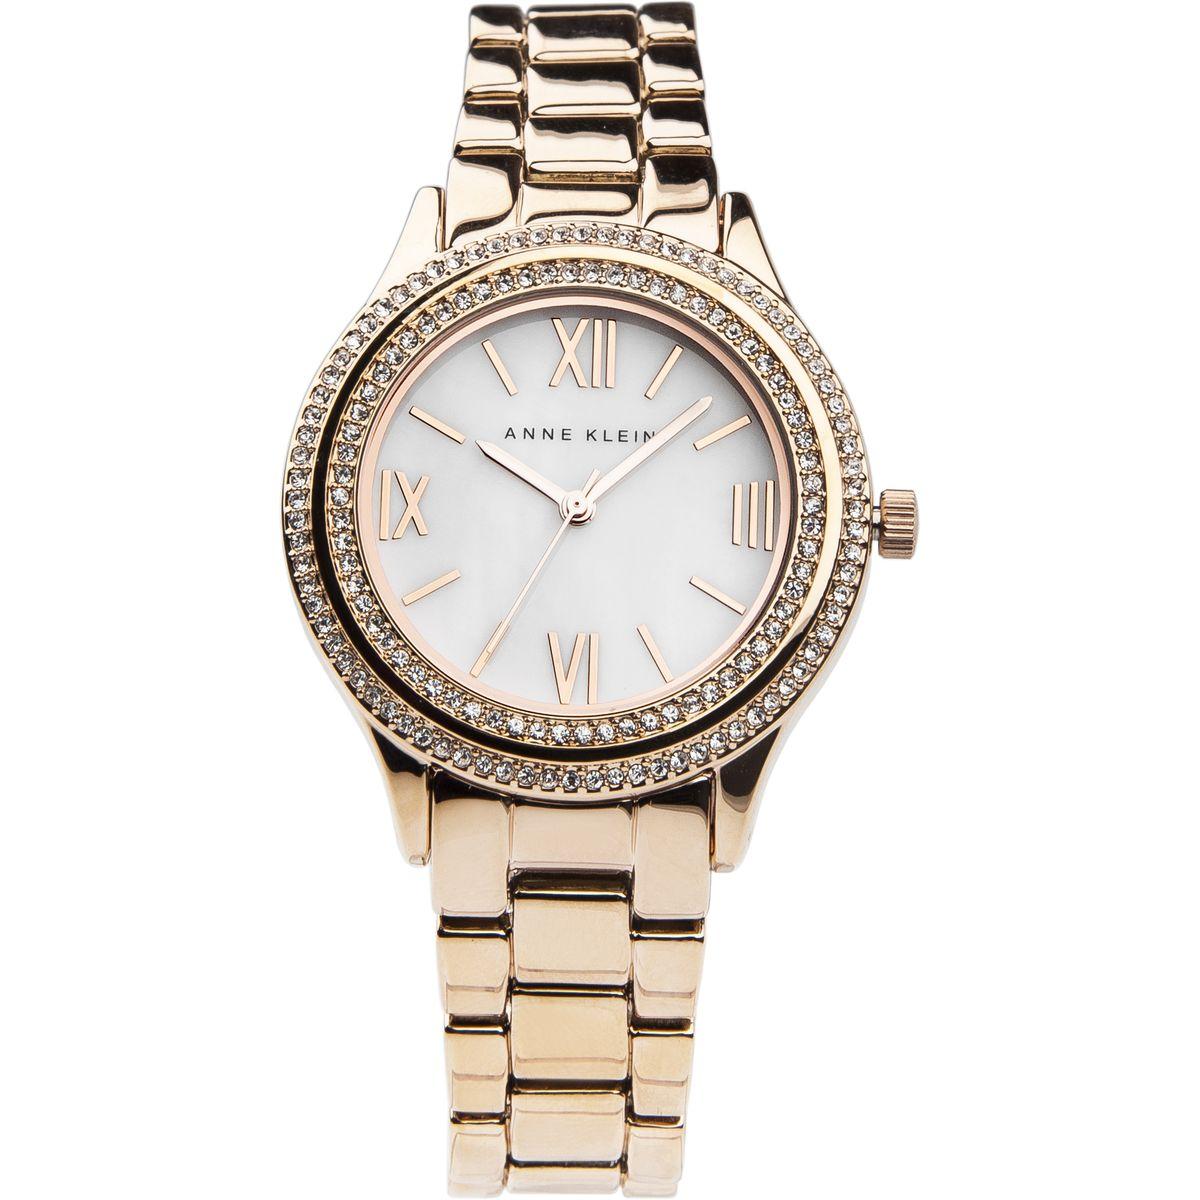 Наручные часы женские Anne Klein, цвет: золотистый, розовый. 2006MPRG2006MPRGОригинальные и качественные часы Anne Klein